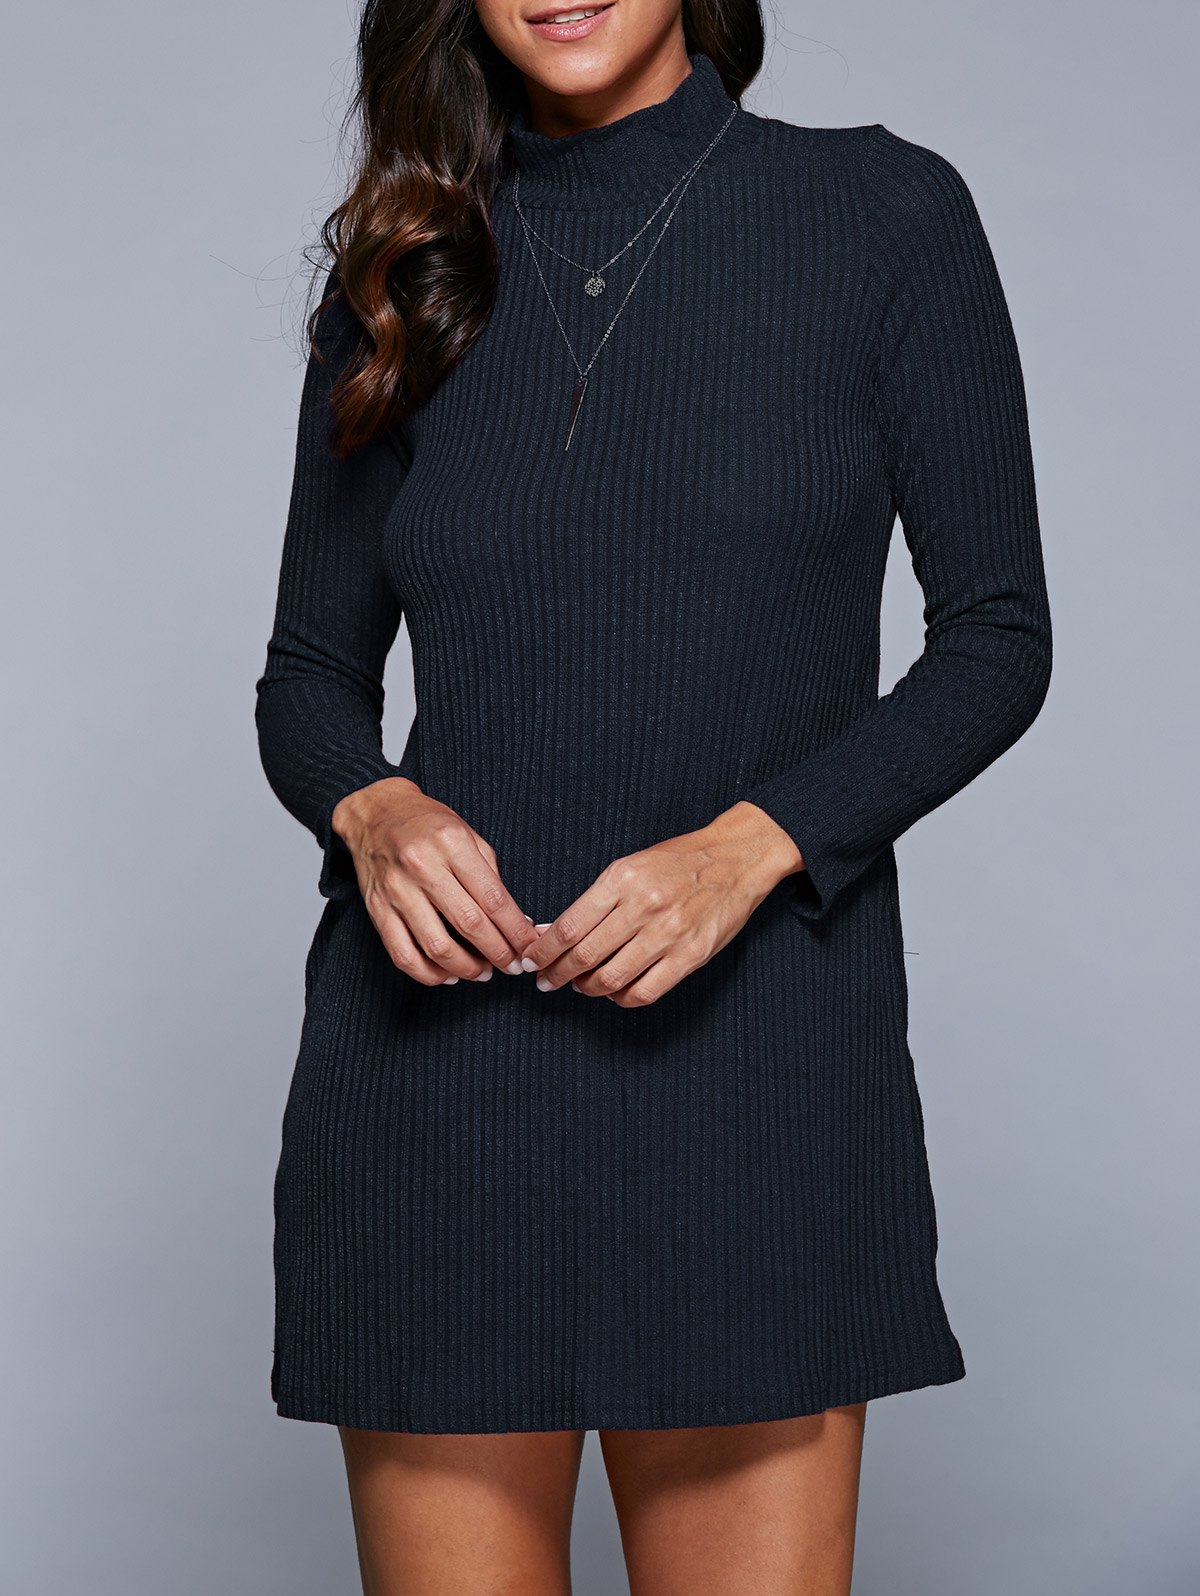 Long Sleeve Mini A Line Sweater Dress